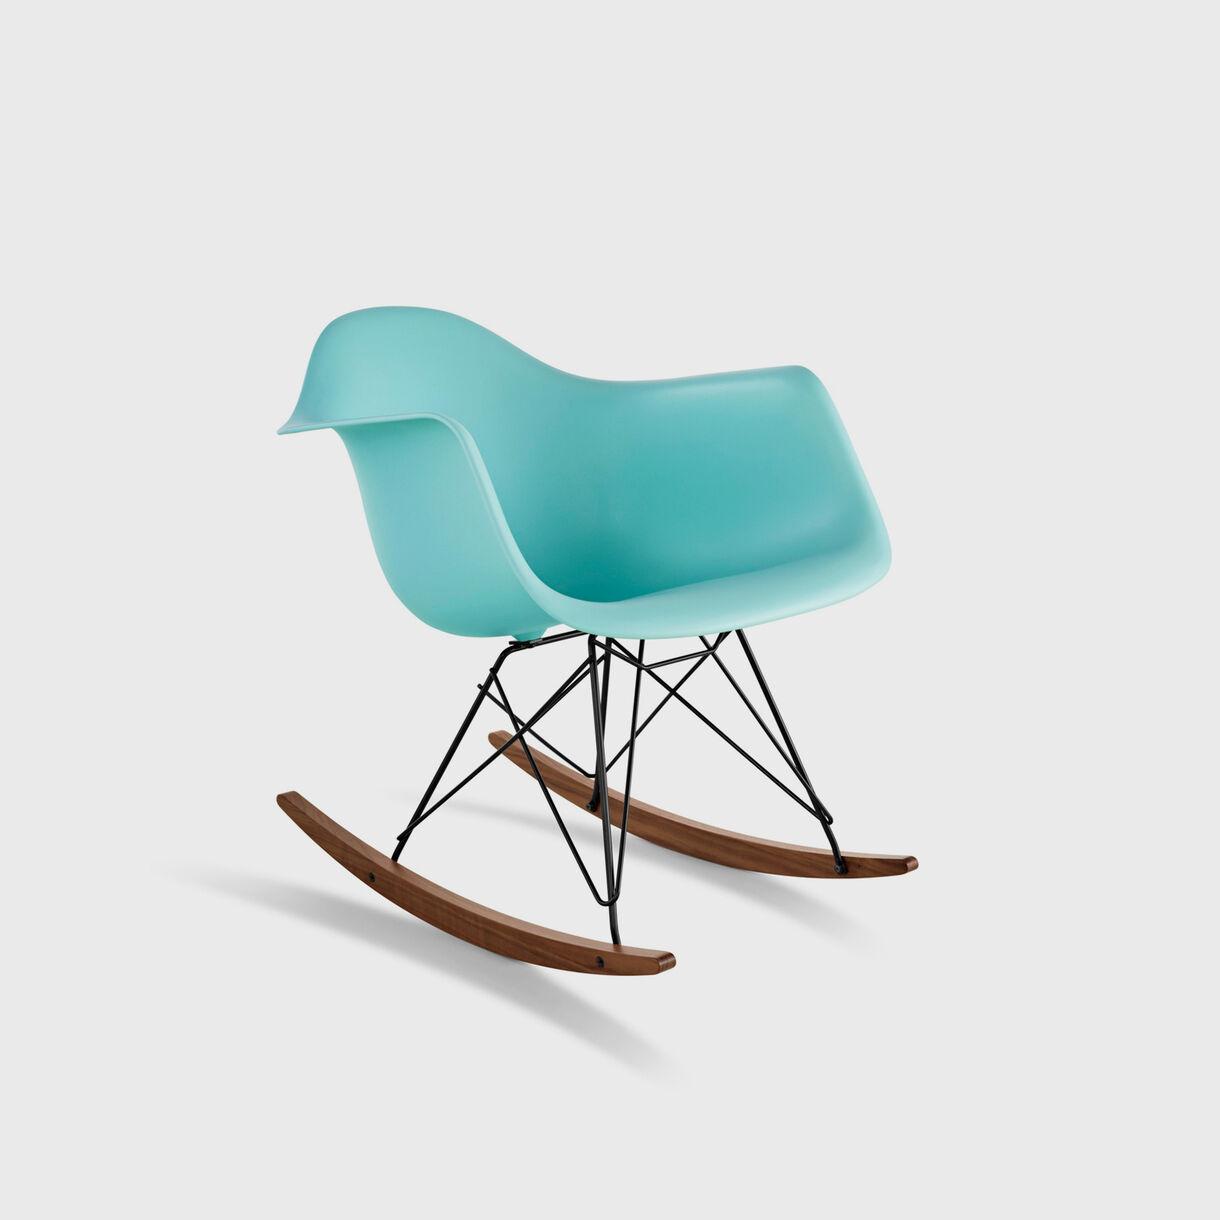 Eames Moulded Plastic Armchair, Rocker Base